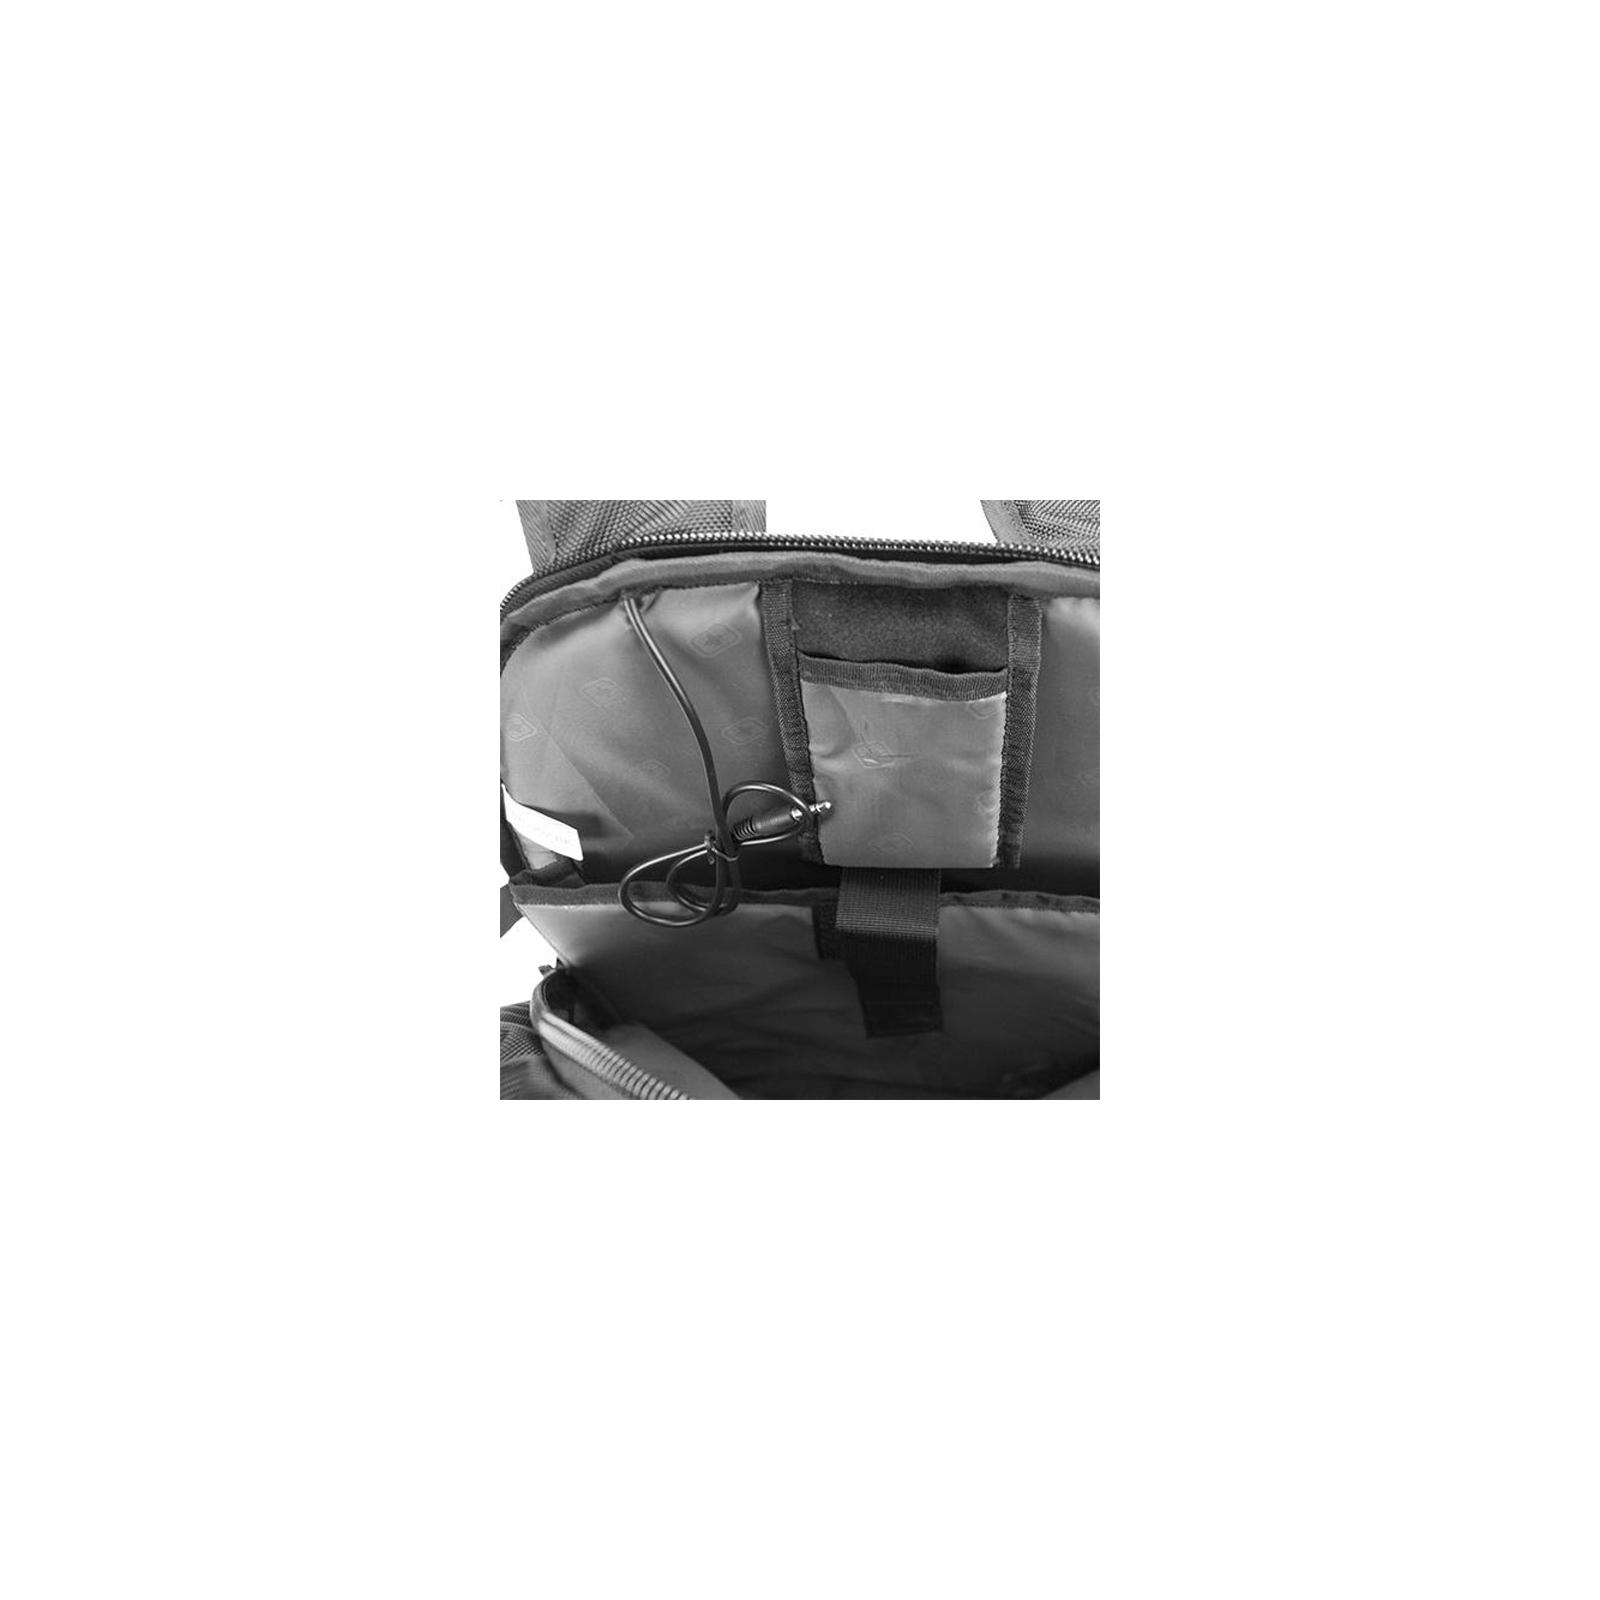 Рюкзак для ноутбука Continent 16'' BP-302 BK (BP-302BK) изображение 6